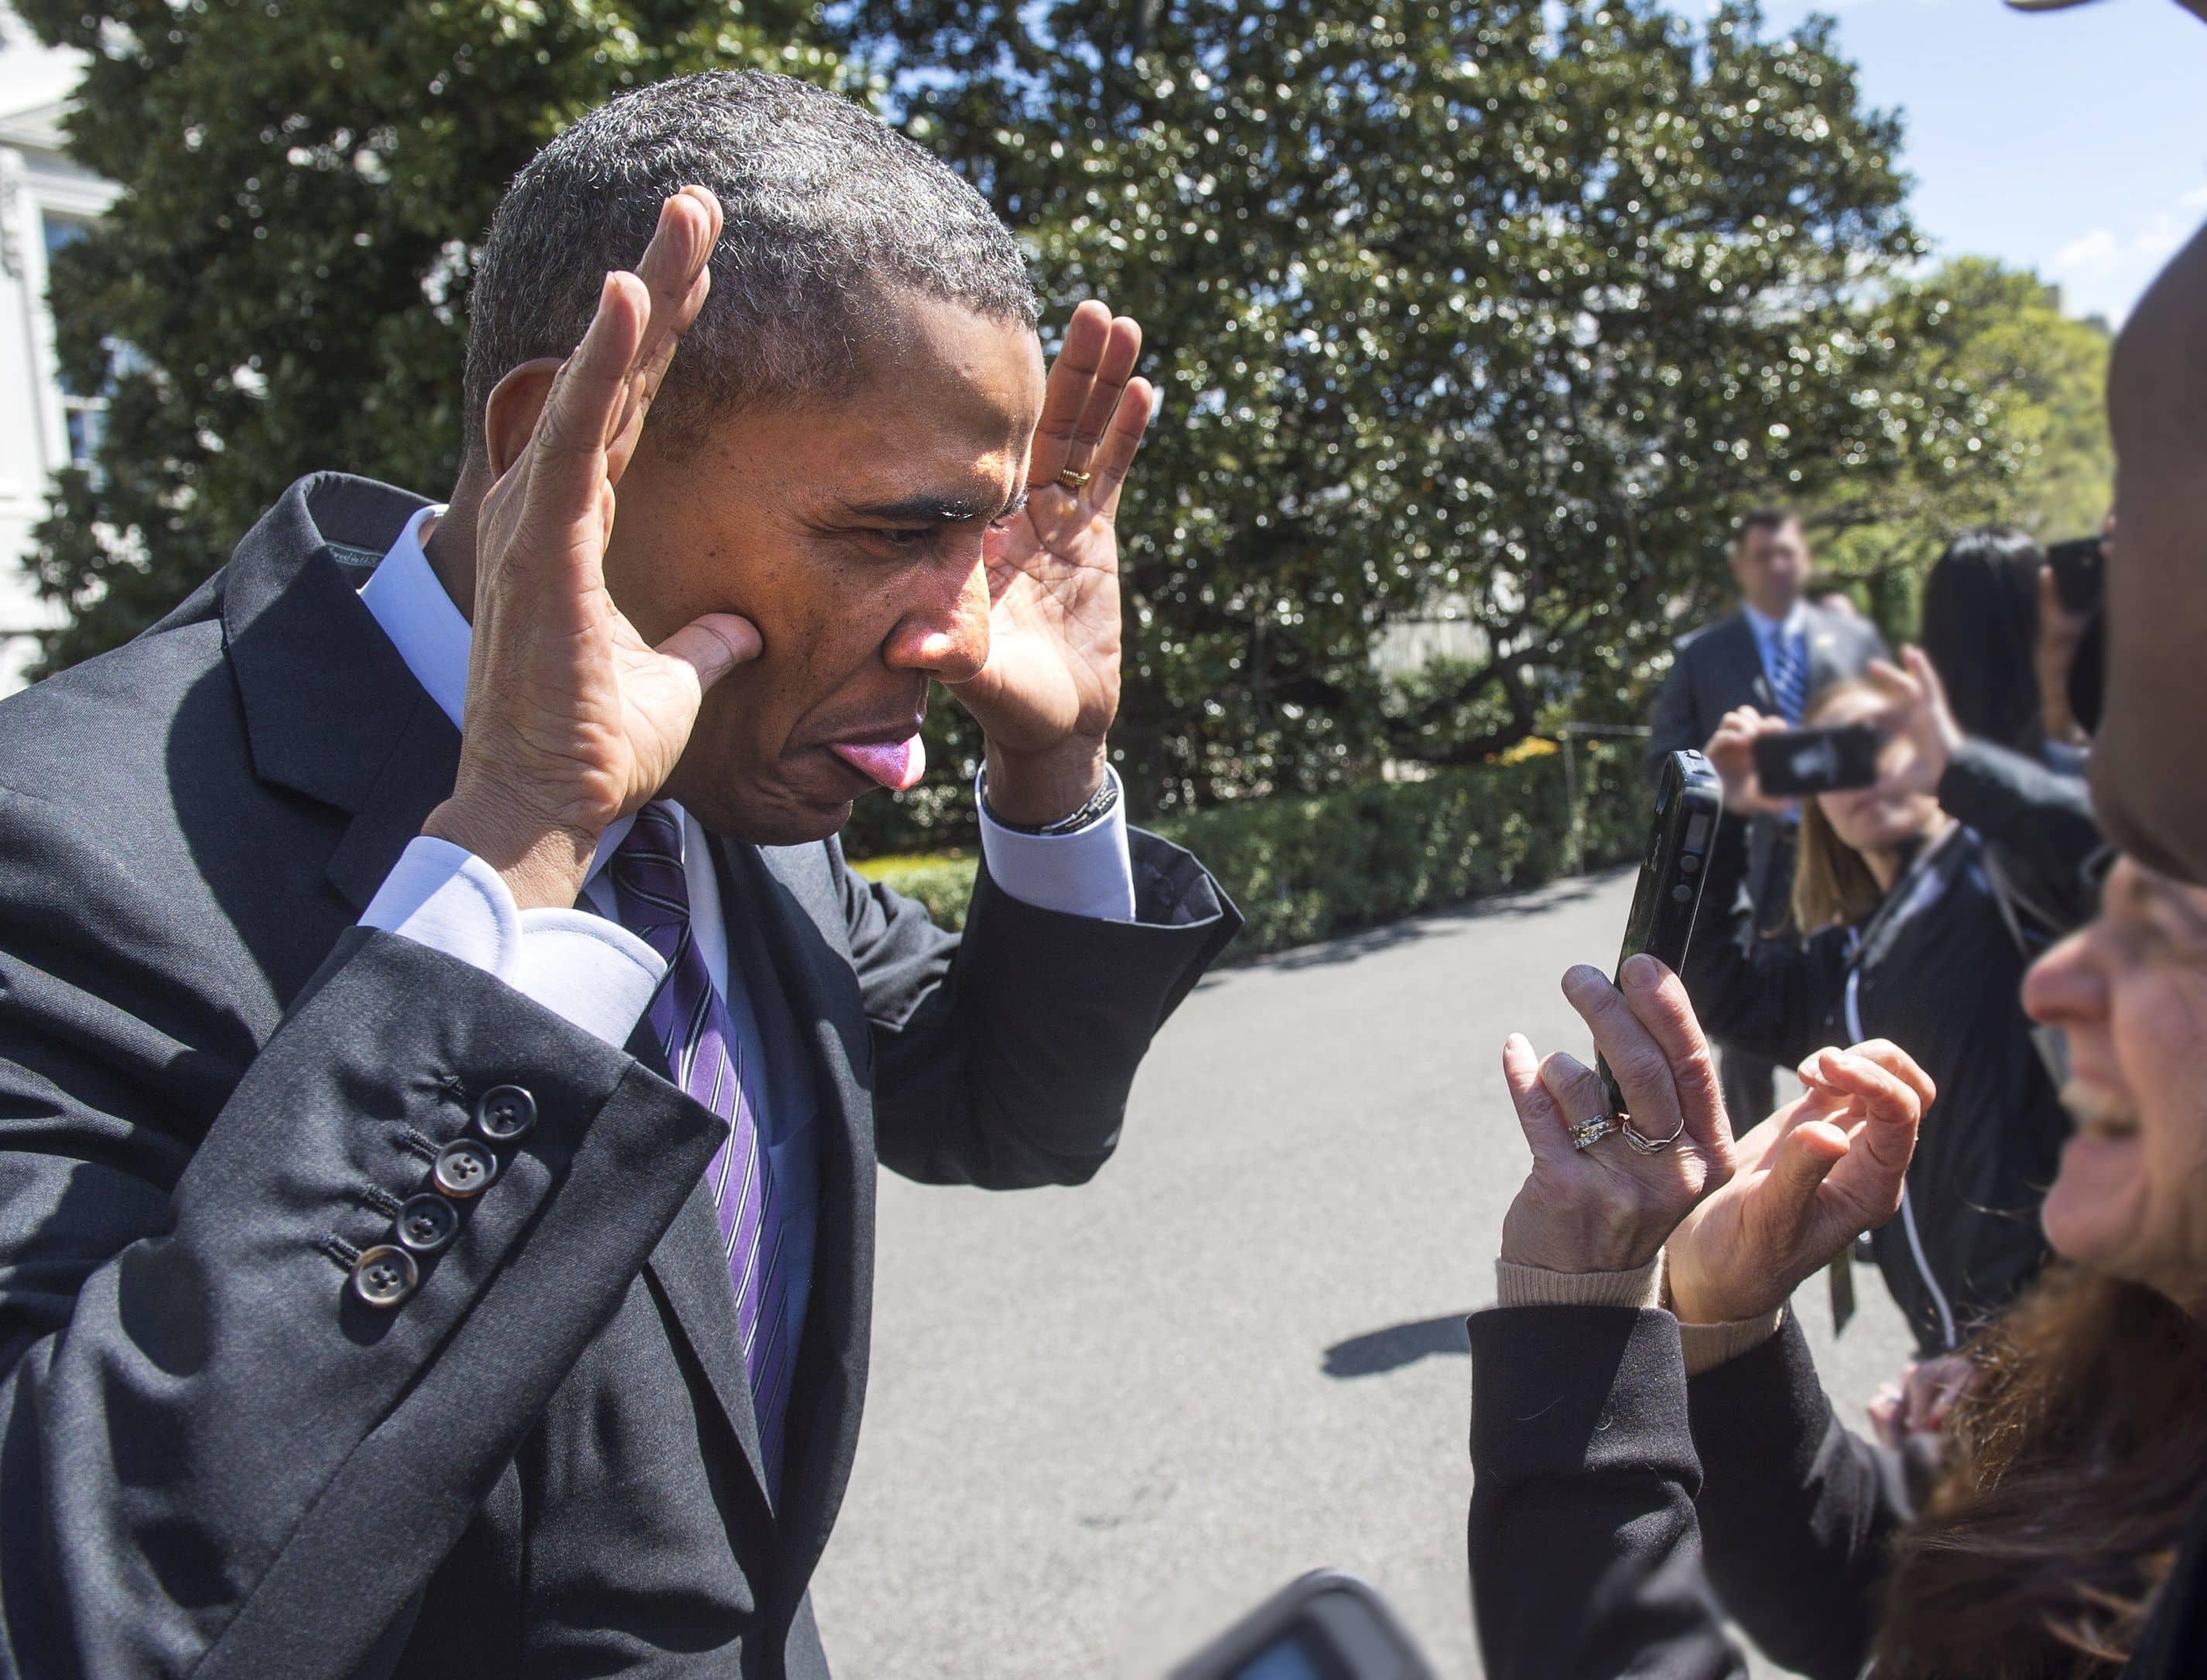 THANK YOU OBAMA オバマ チャンス・ザ・ラッパー